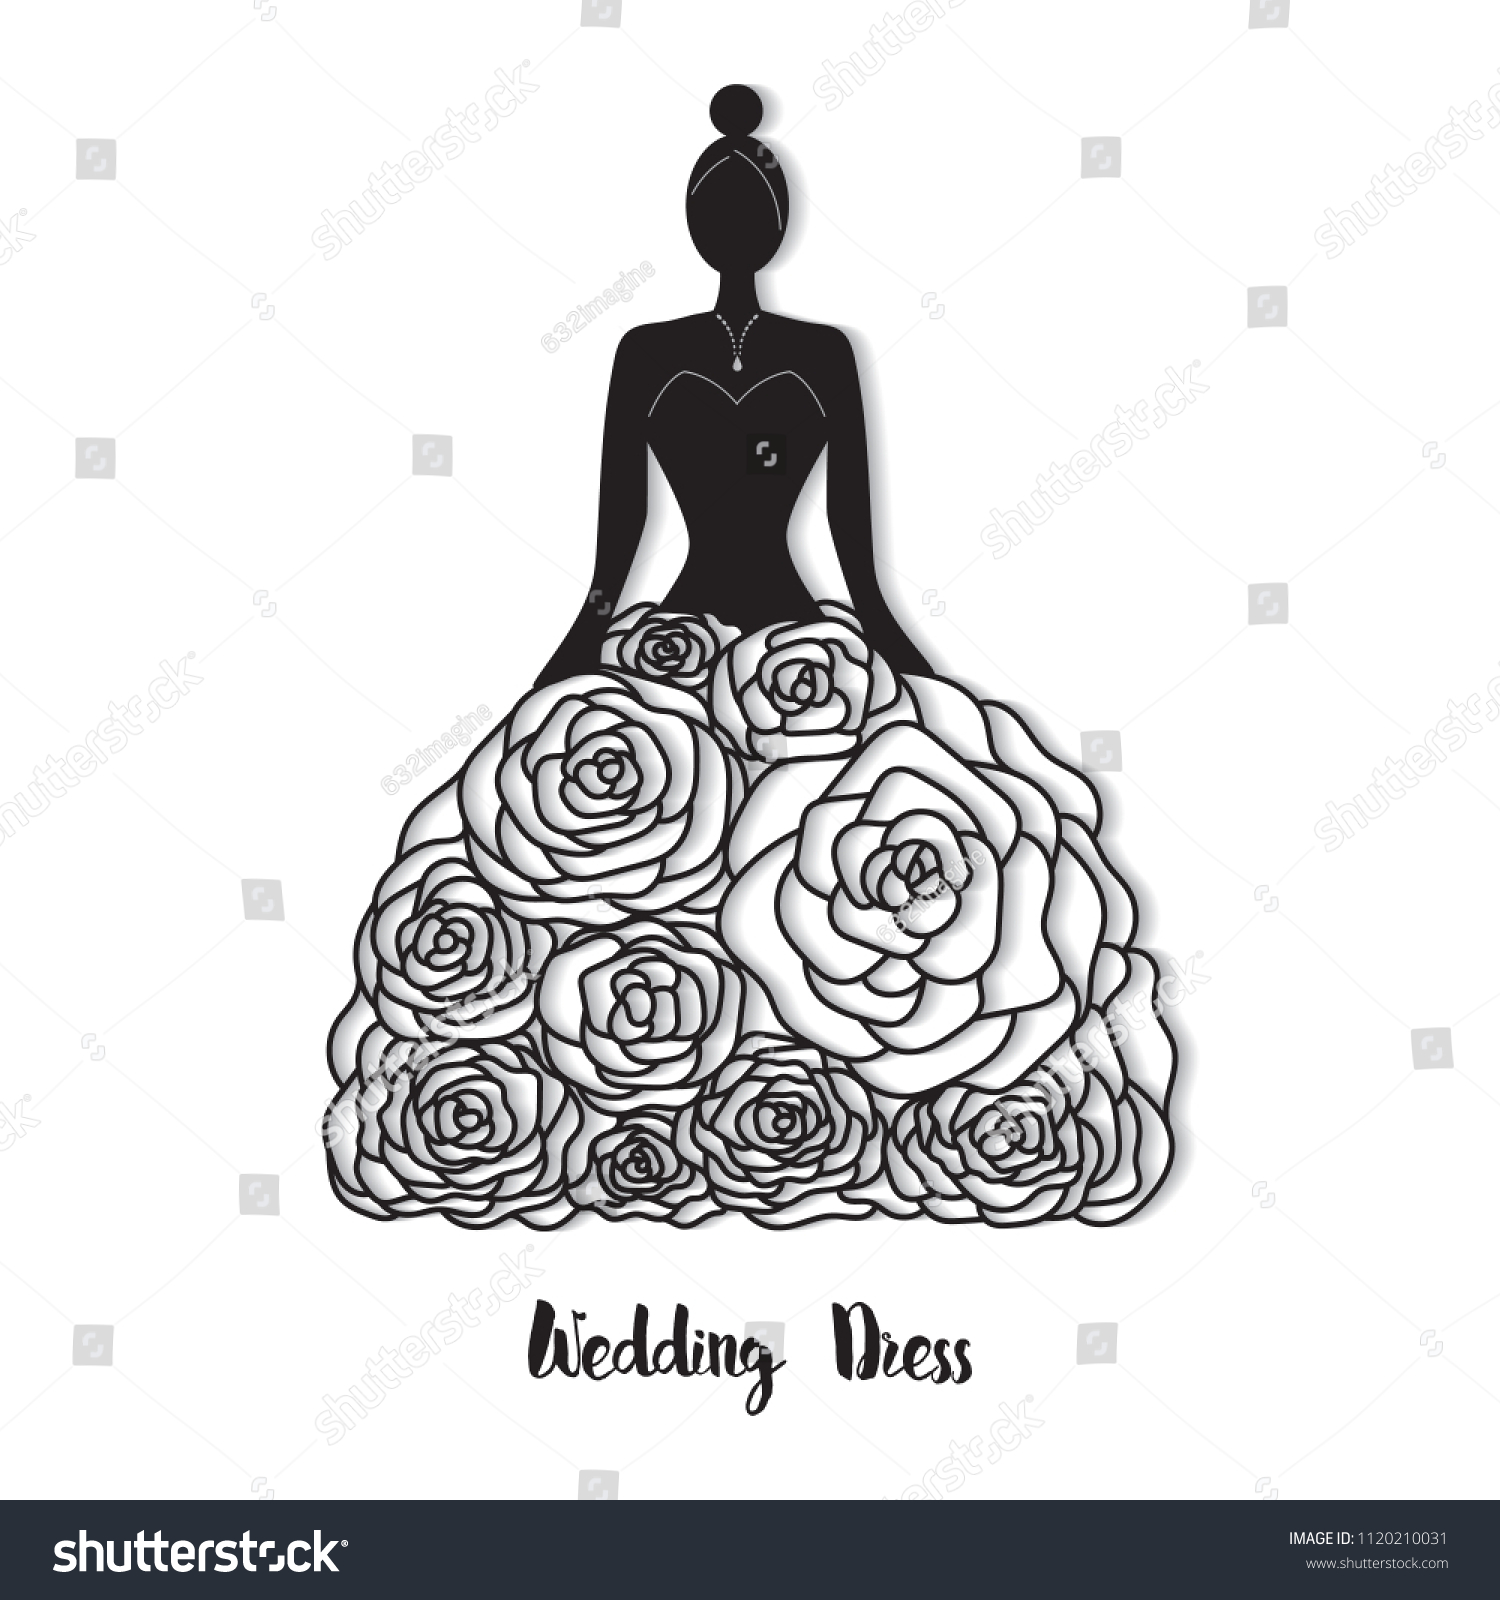 Ornate Wedding Dress Laser Cut Template Stock Vector (Royalty Free ...